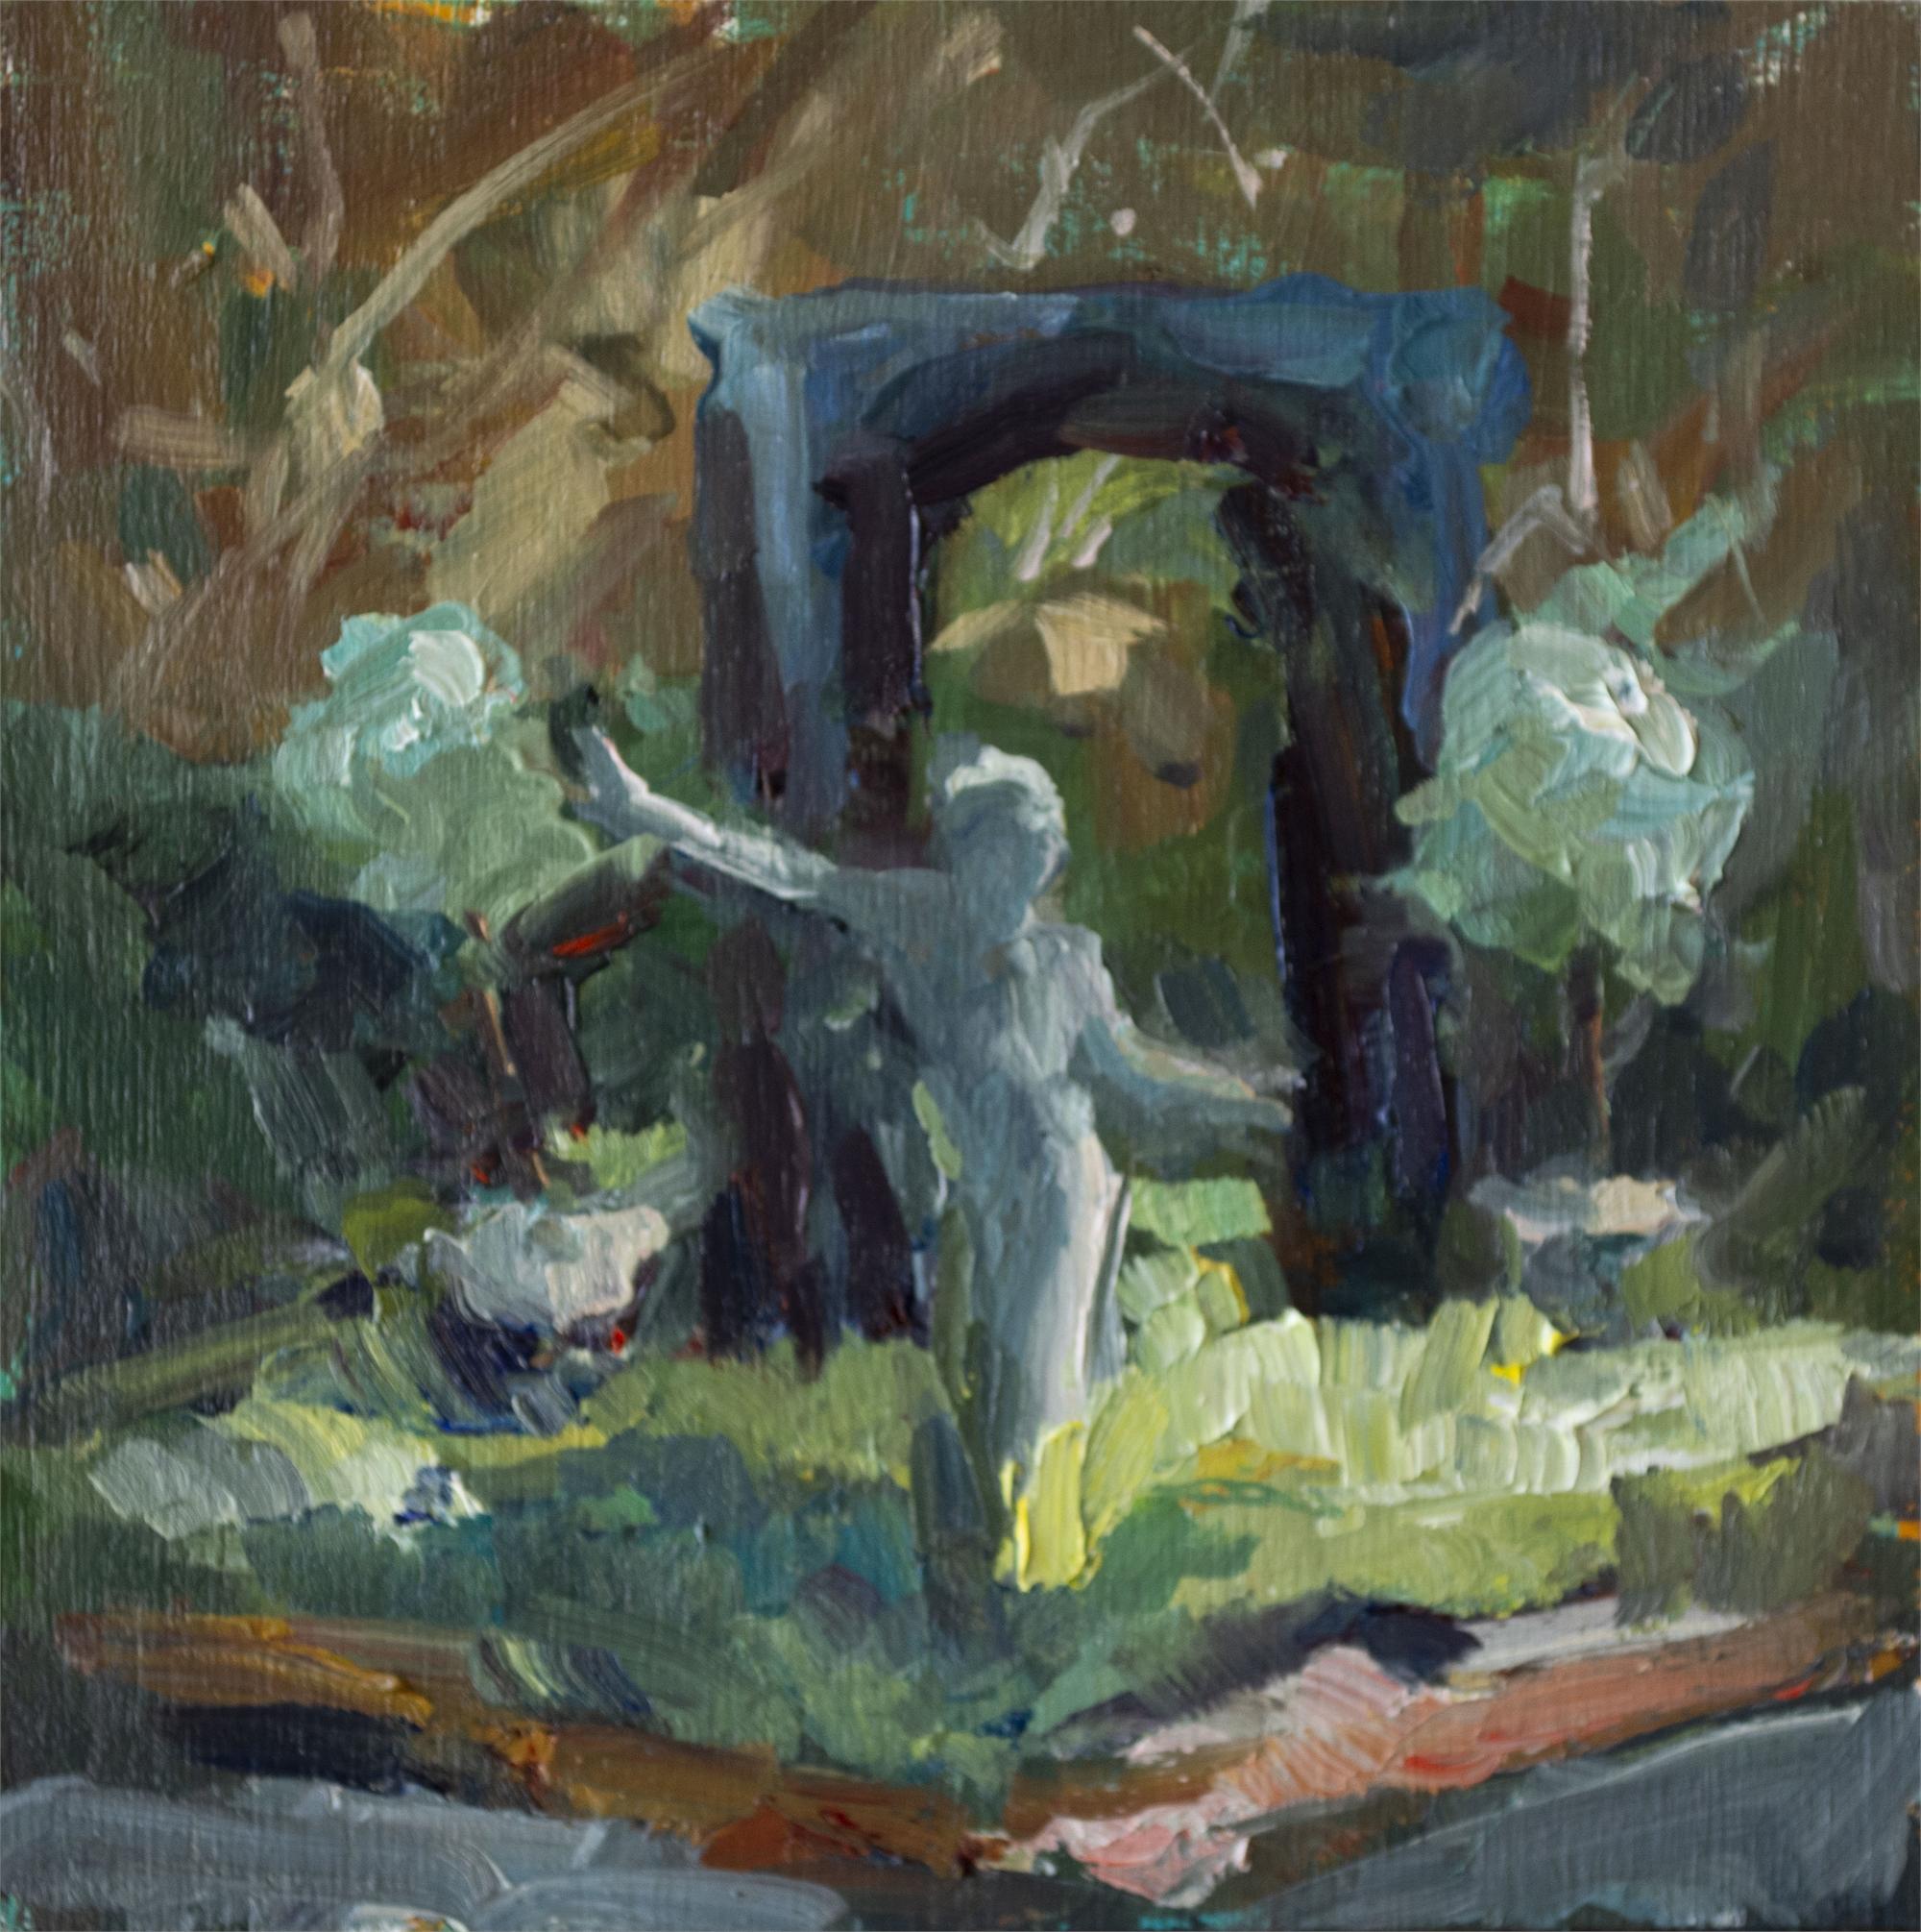 Lighted Statue in Garden by Karen Hewitt Hagan